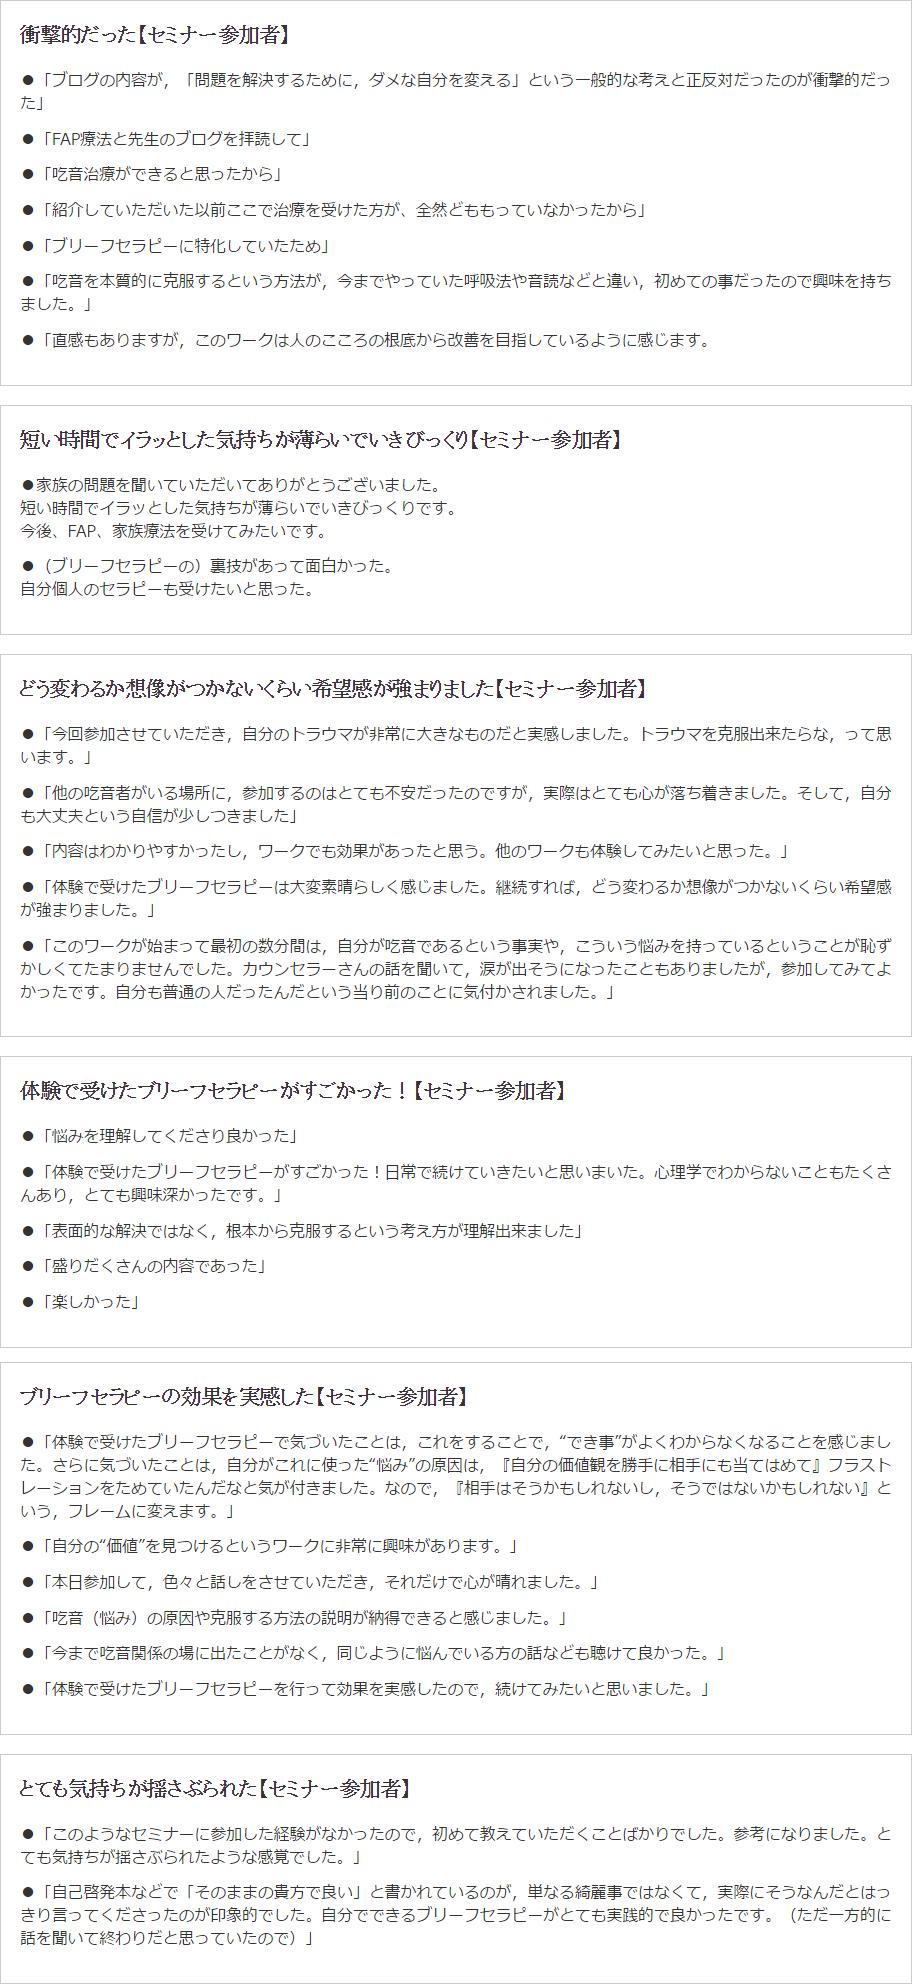 screenshot_239